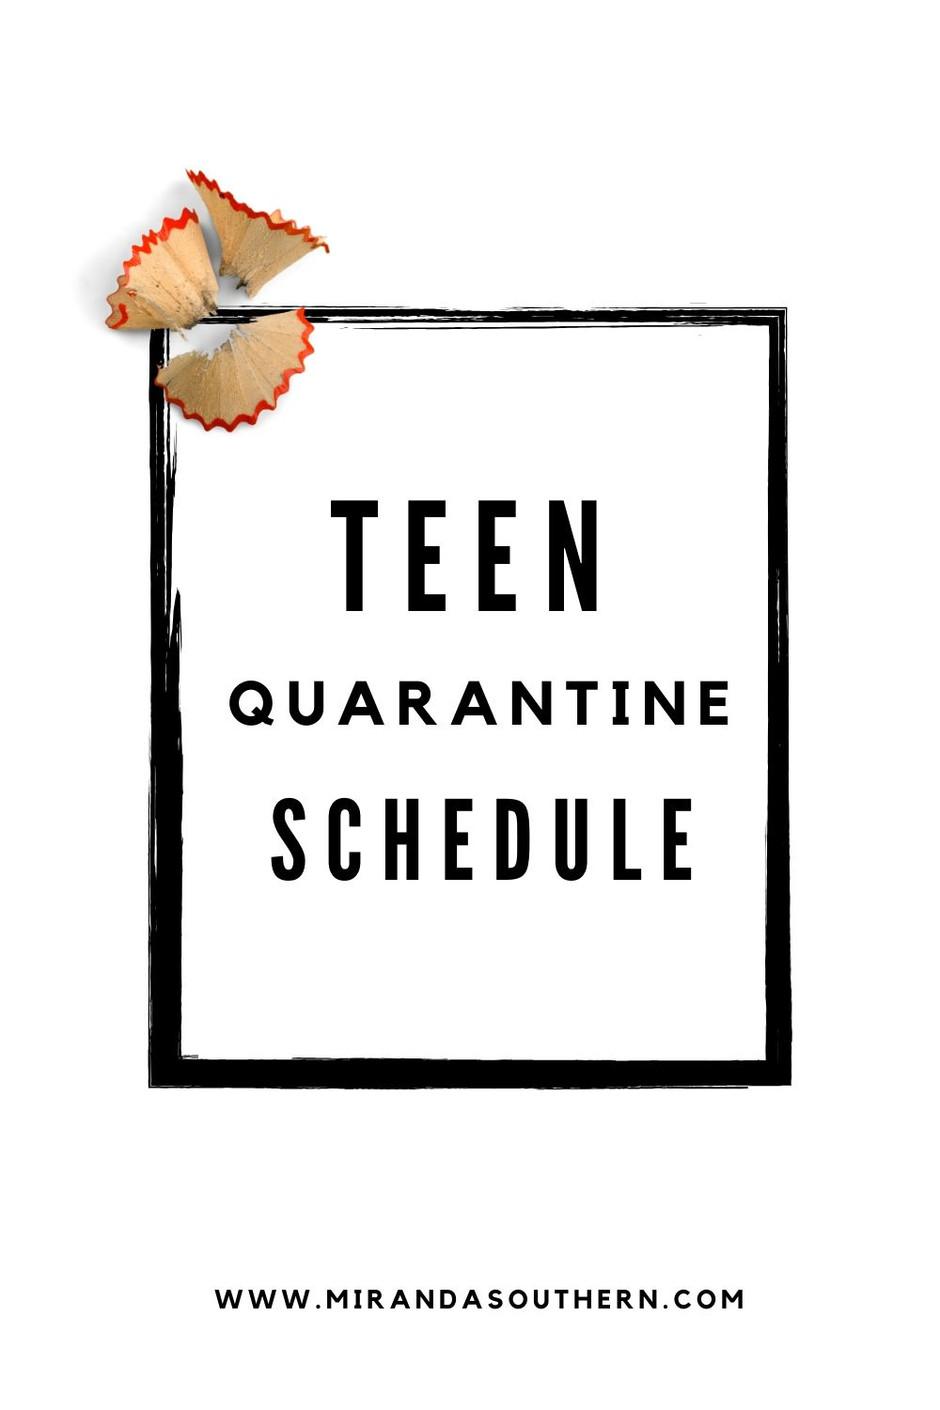 Teen Quarantine Schedule